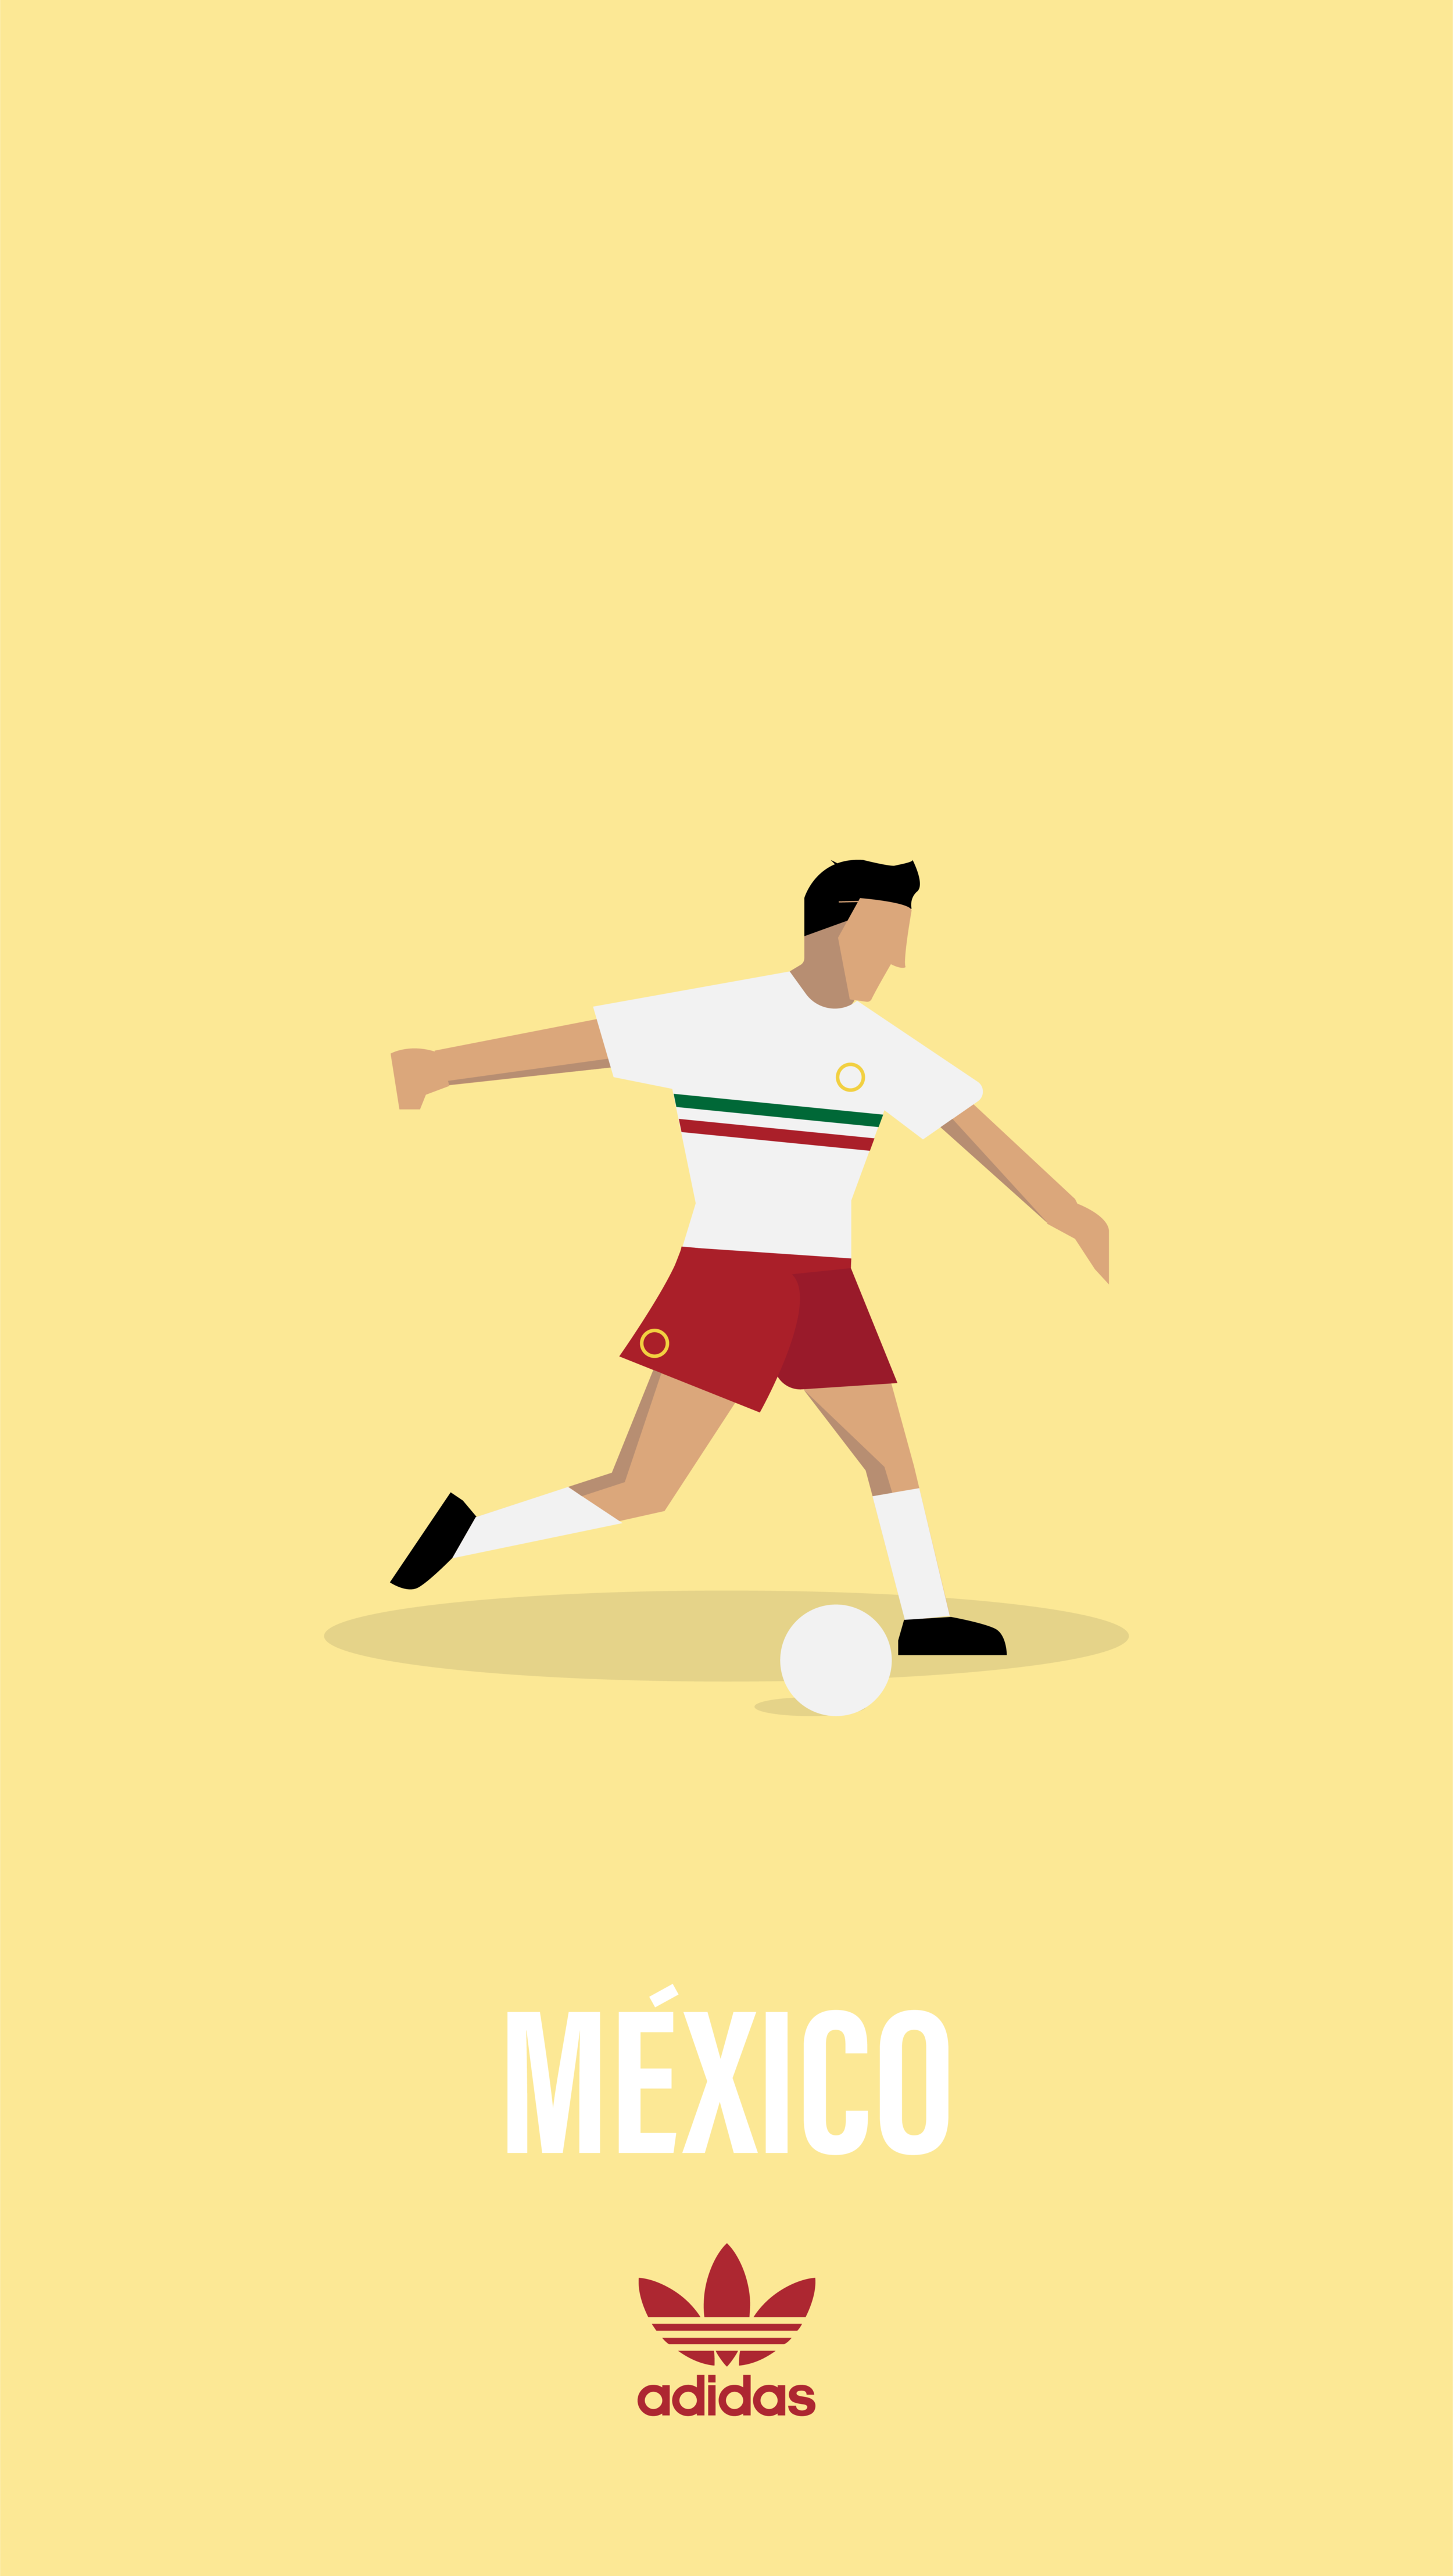 TEAMS_FIFA-02.png